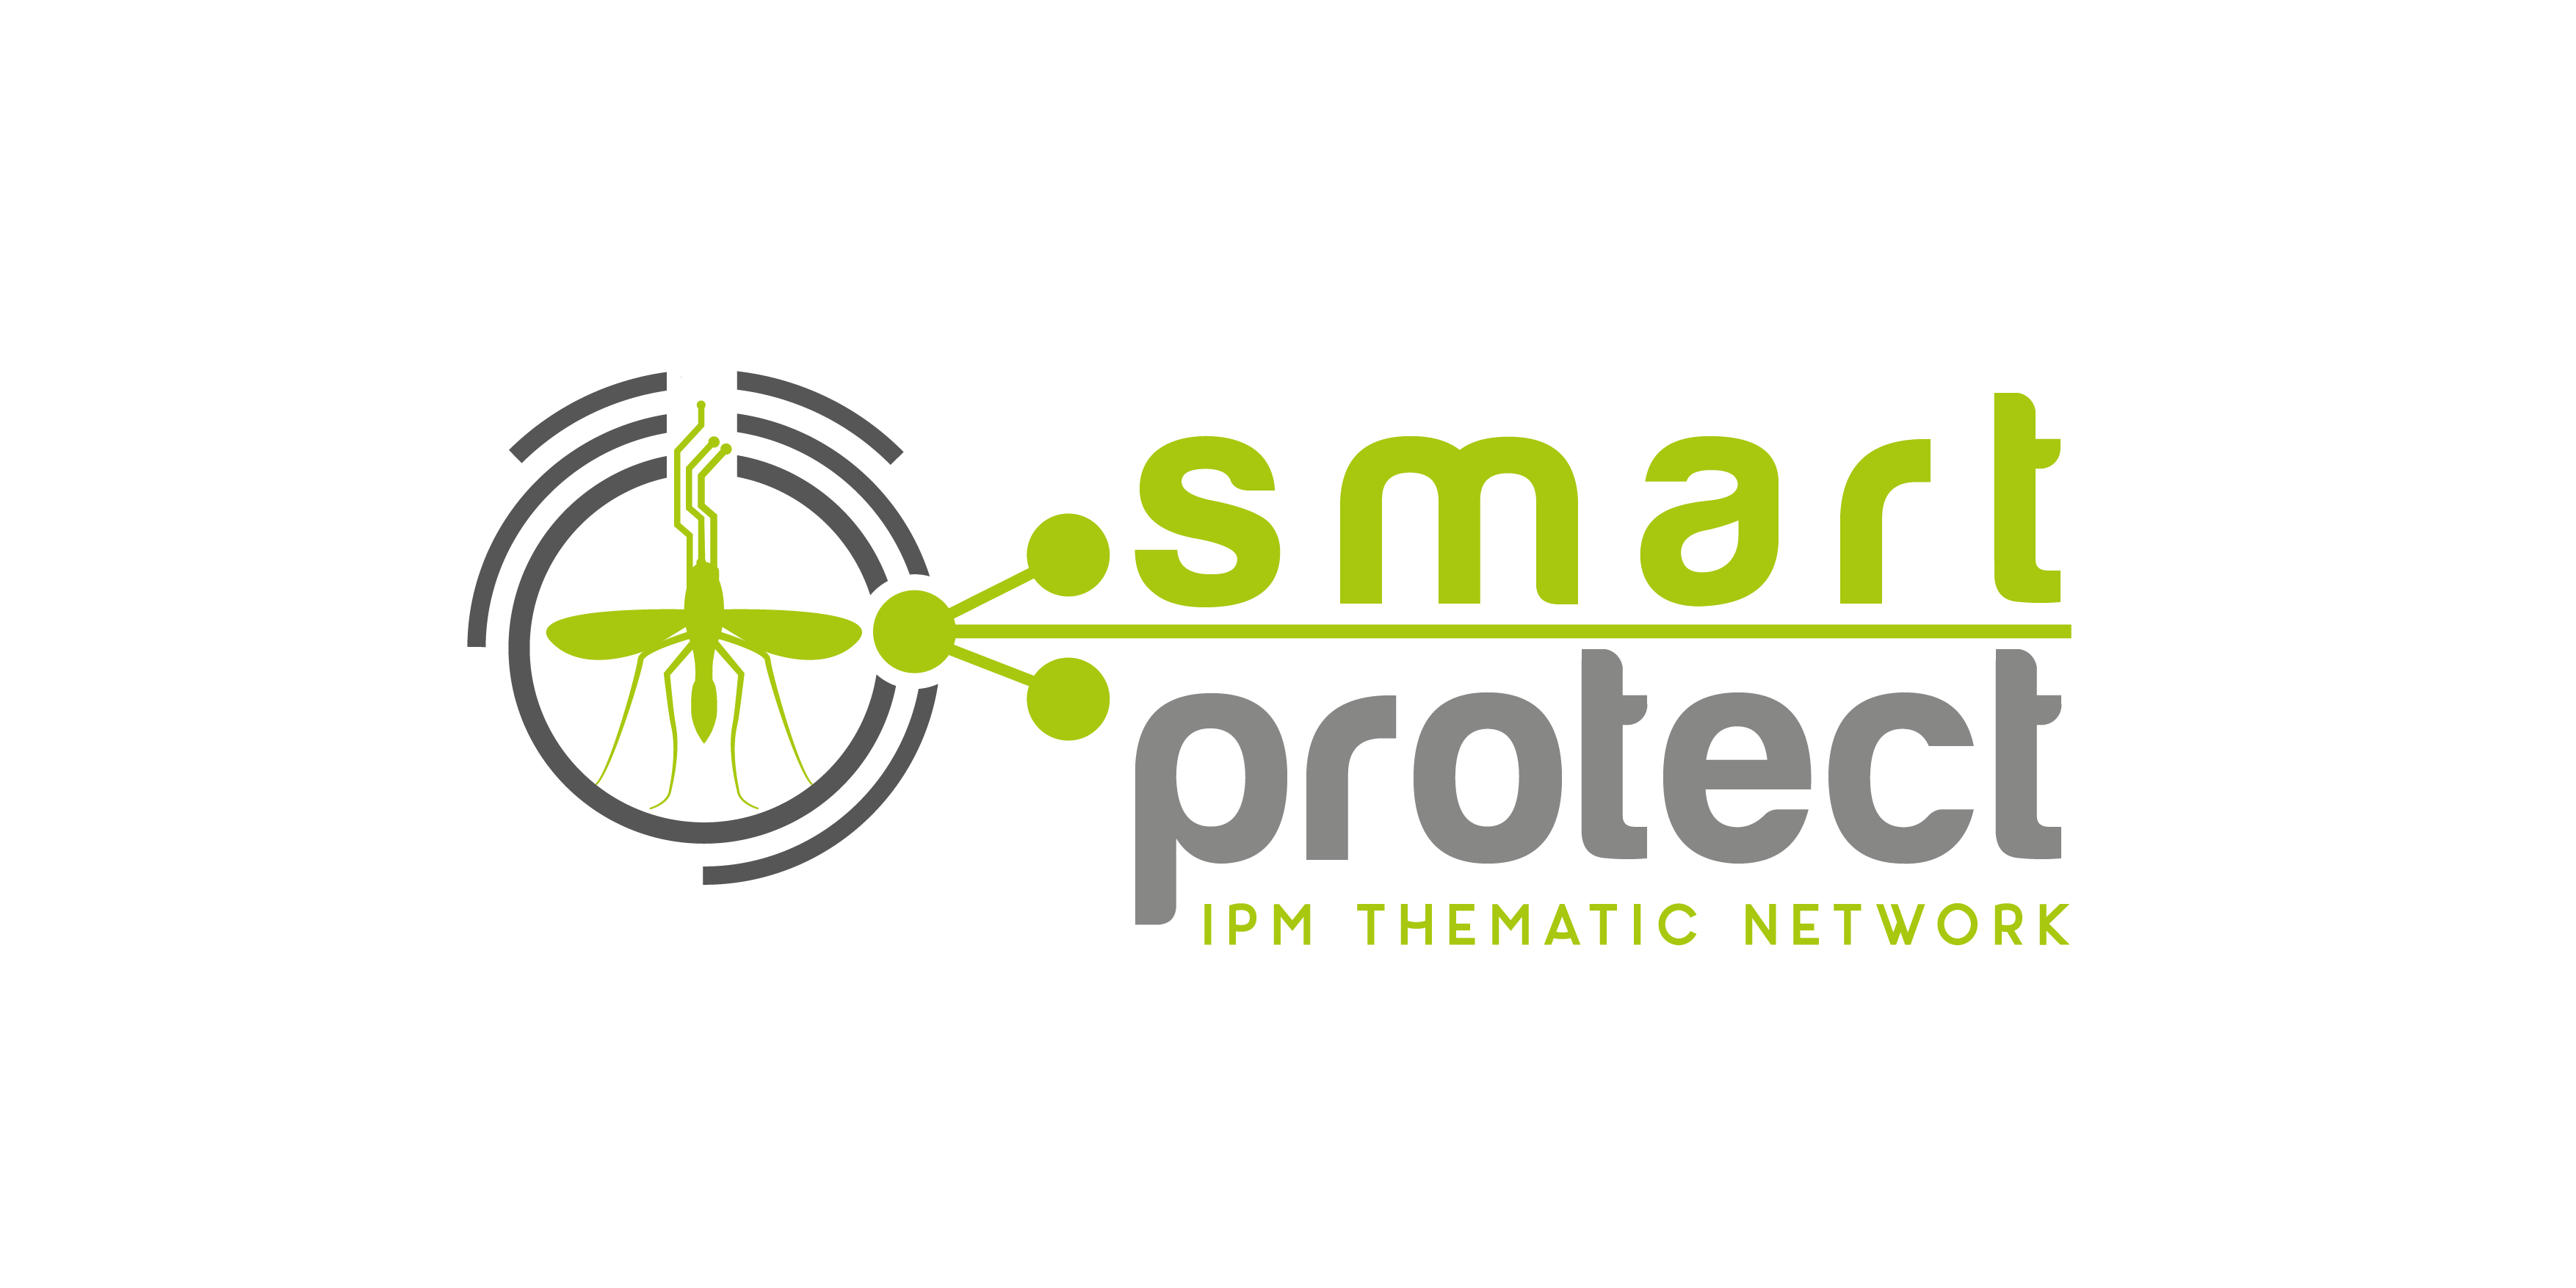 SMARTPROTECT IPM THEMATIC NETWORK